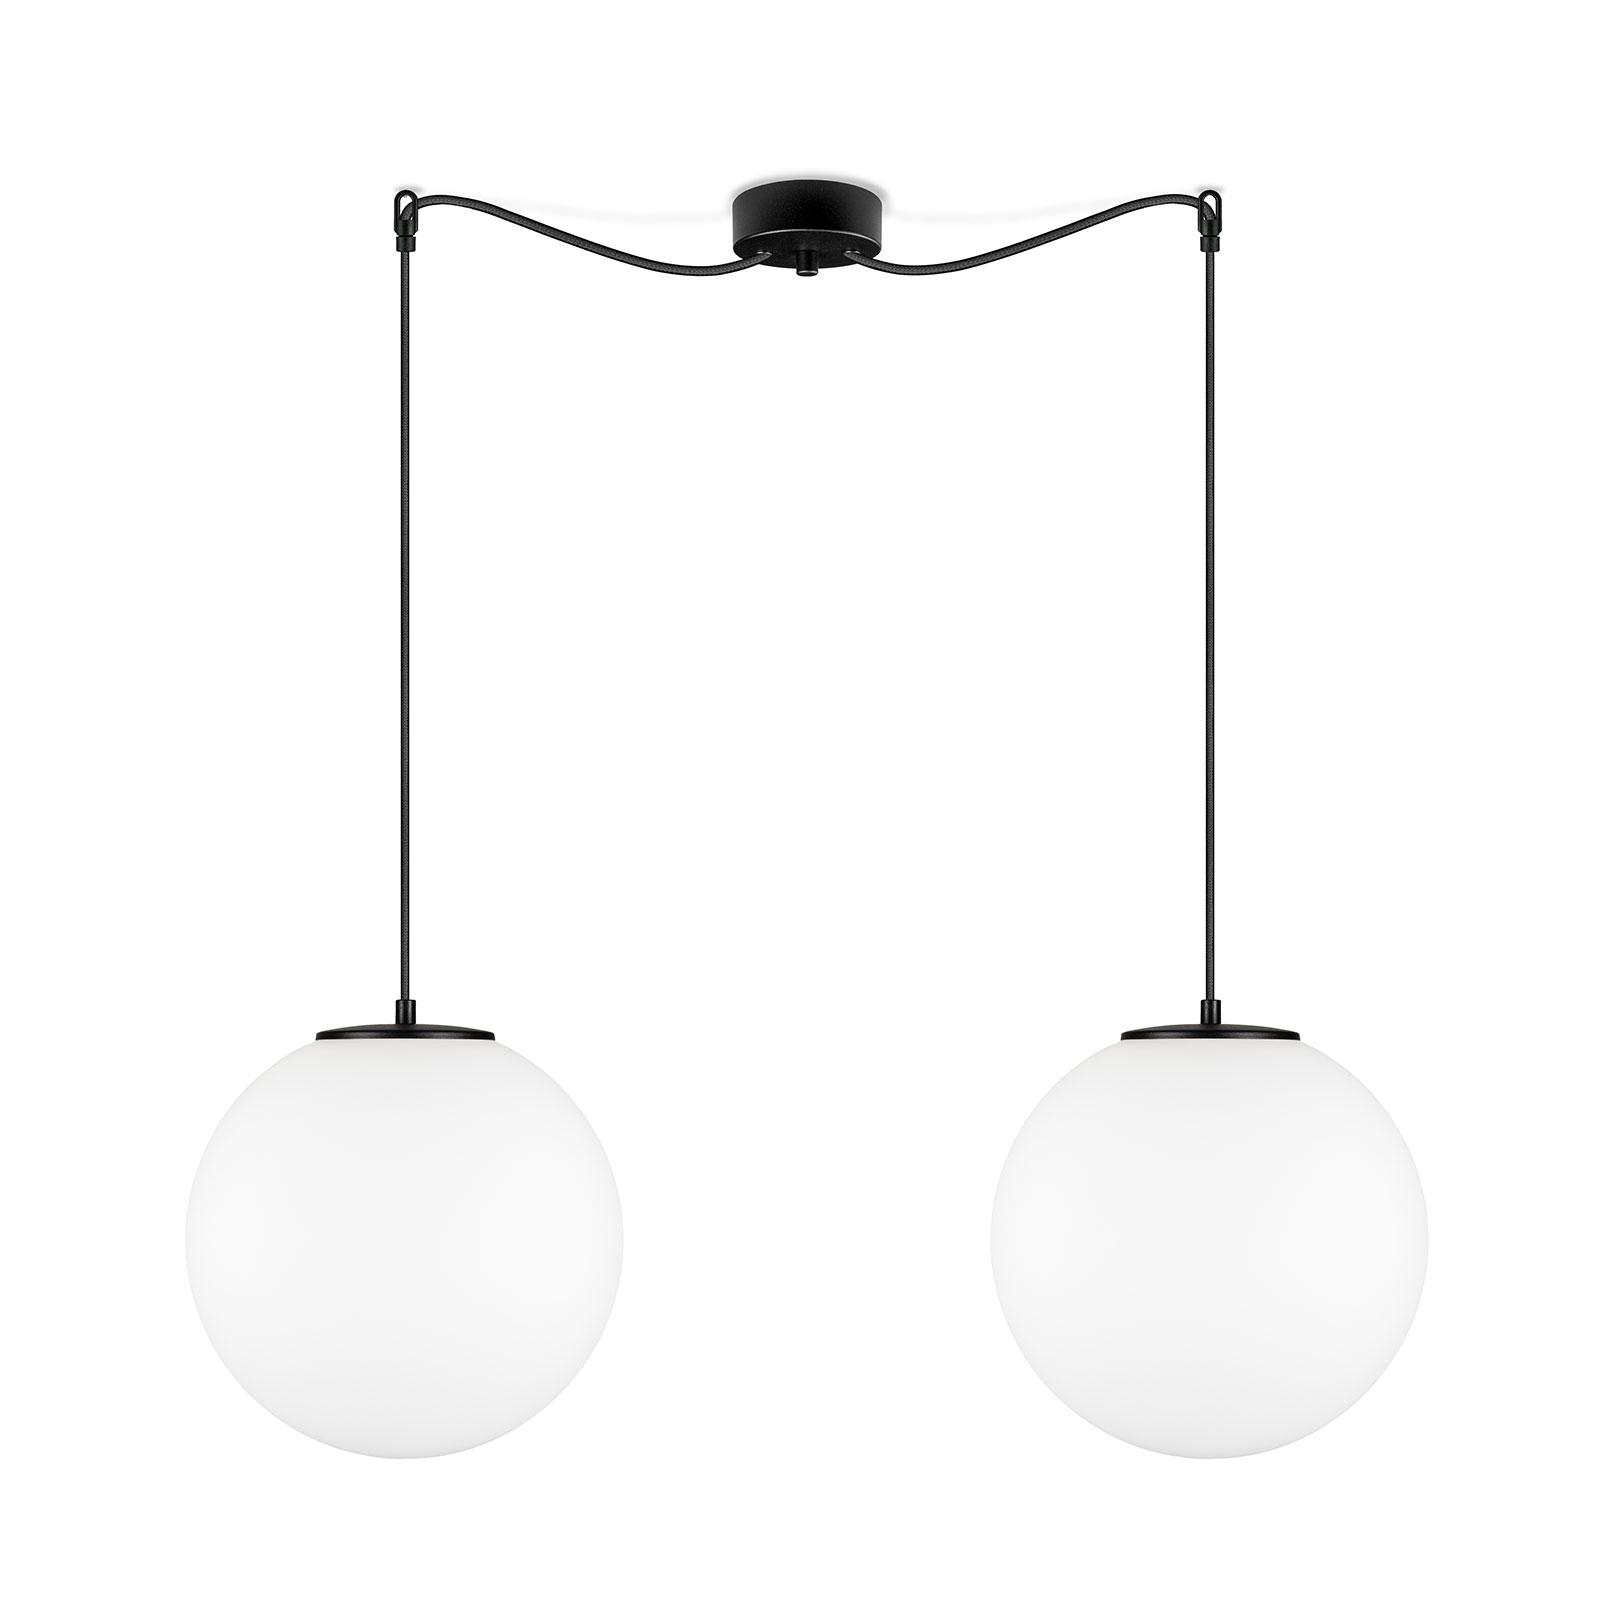 Tsuki L hengelampe, 2 lyskilder, Ø 30 cm, svart